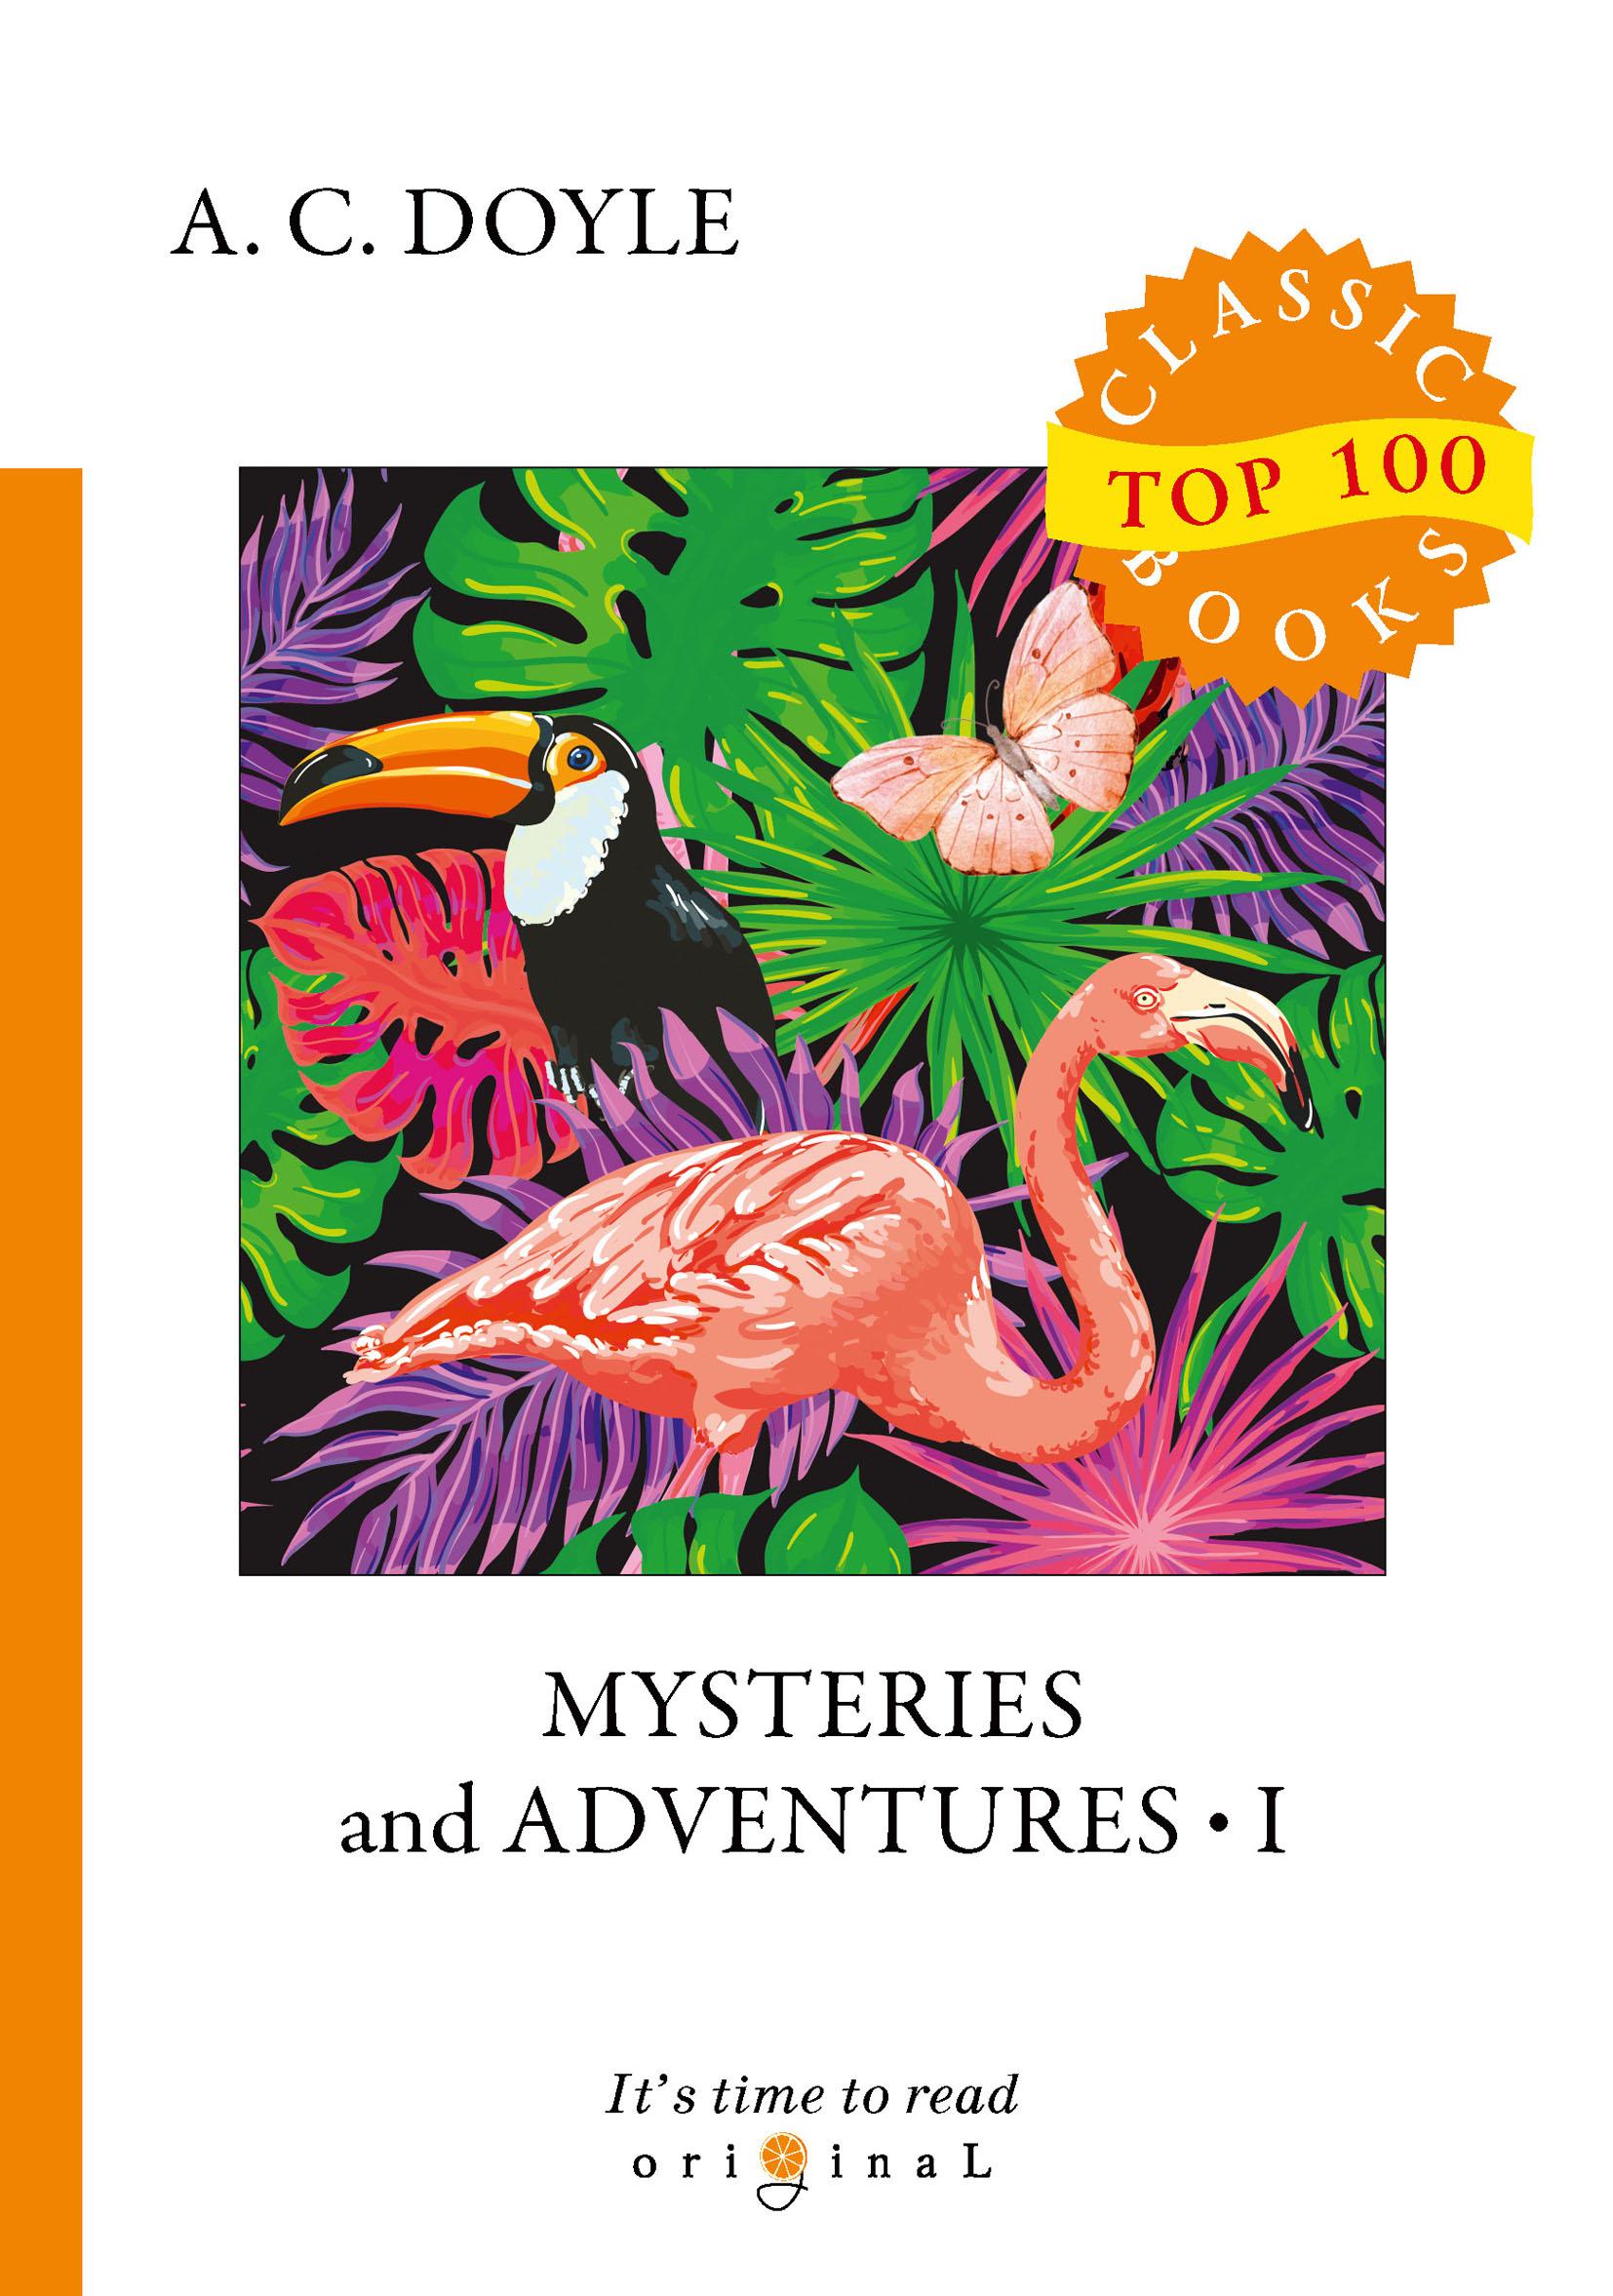 A. C. Doyle Mysteries and Adventures doyle a c memories and adventures воспоминания и приключения на англ яз doyle a c